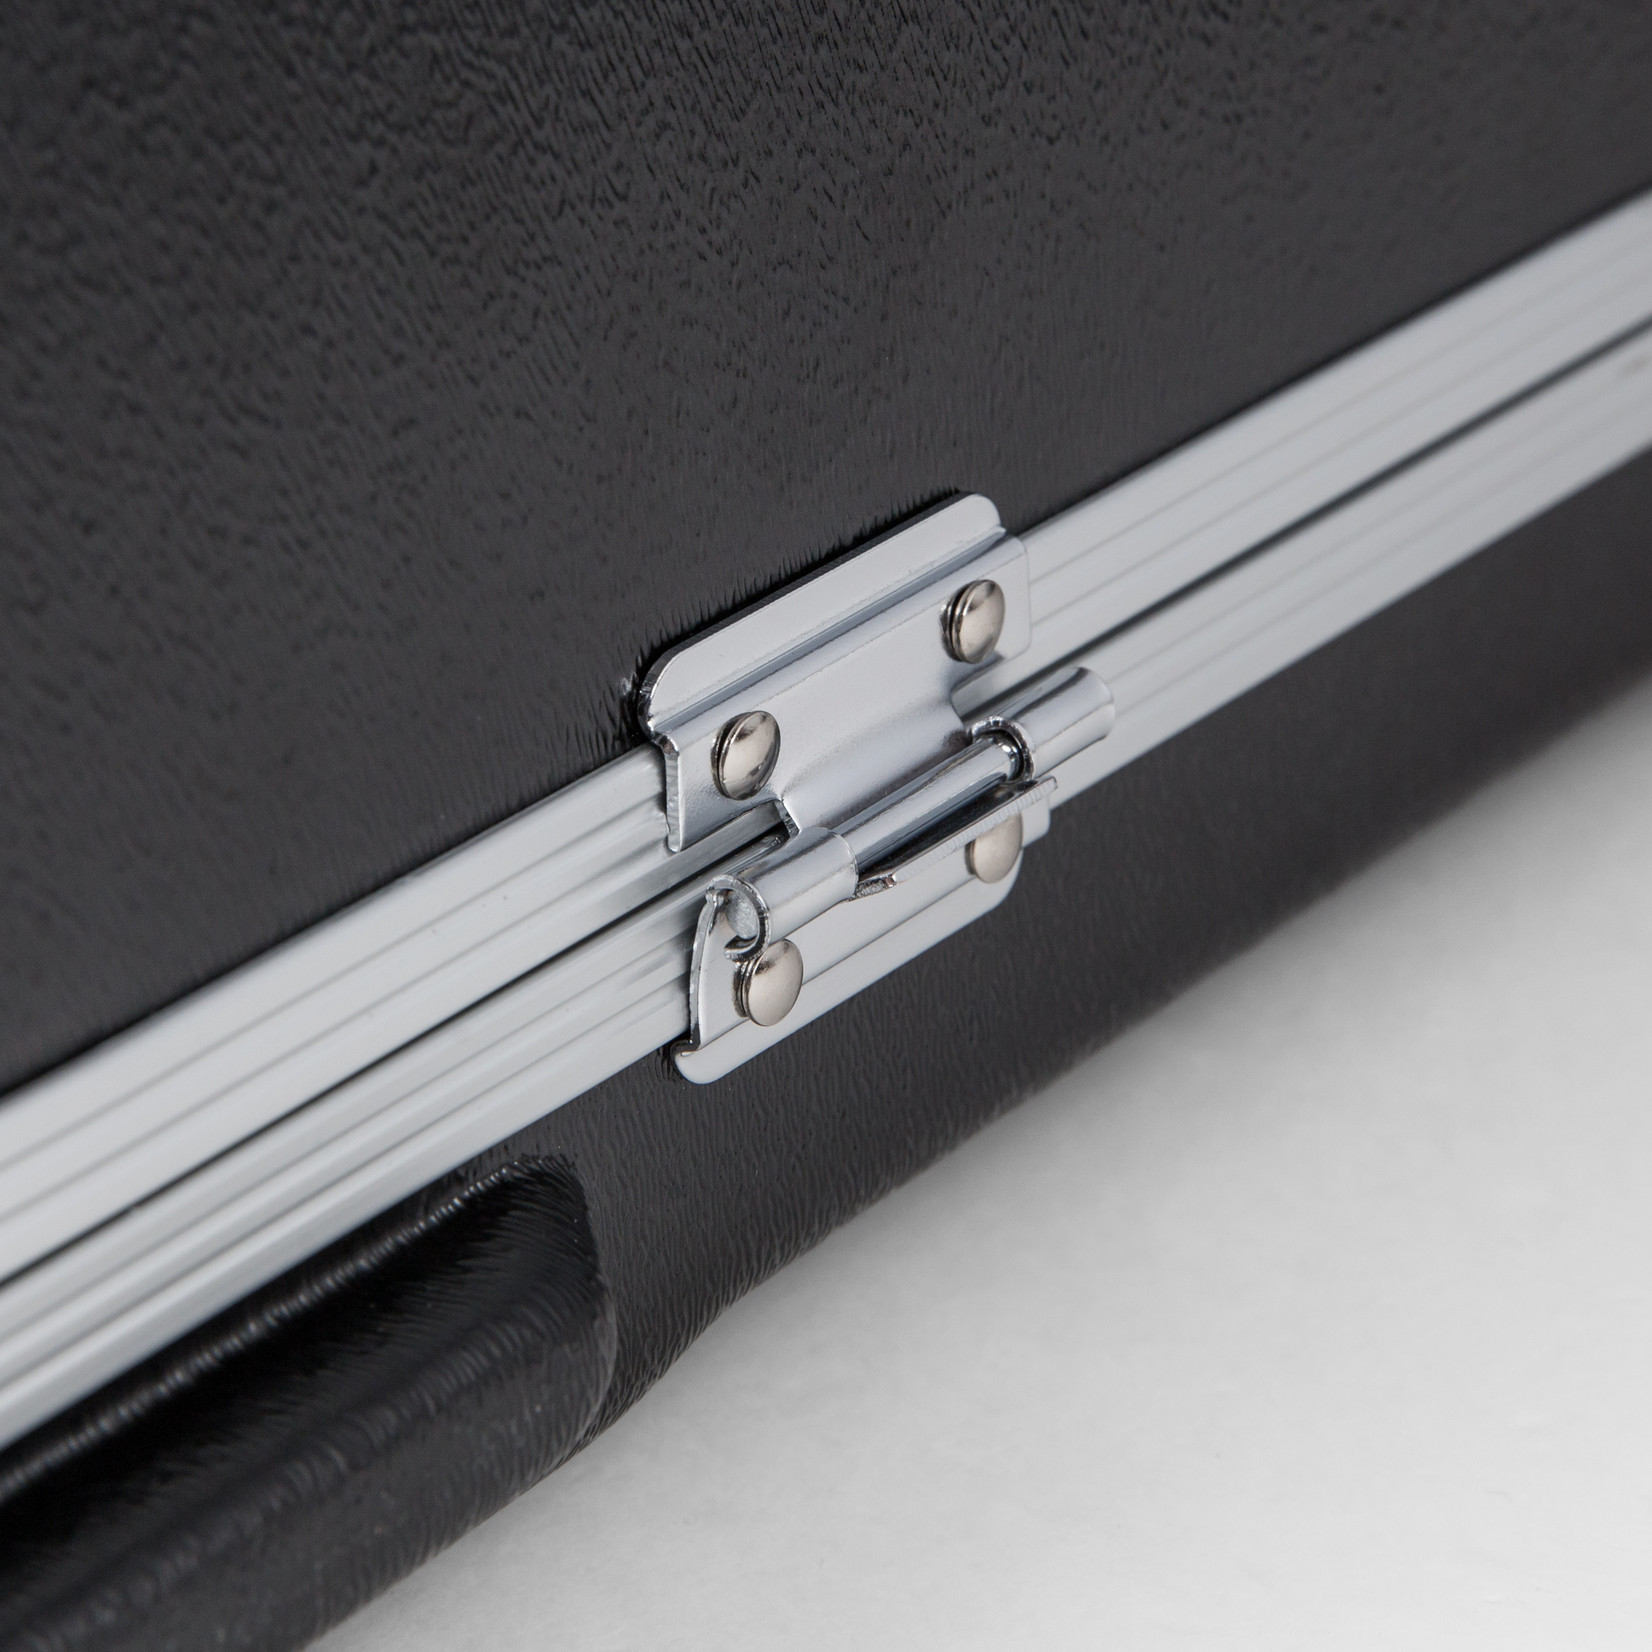 Rockboard RockBoard QUAD 4.1 - Pedalboard with ABS Case (RBO B 4.1 QUAD A )